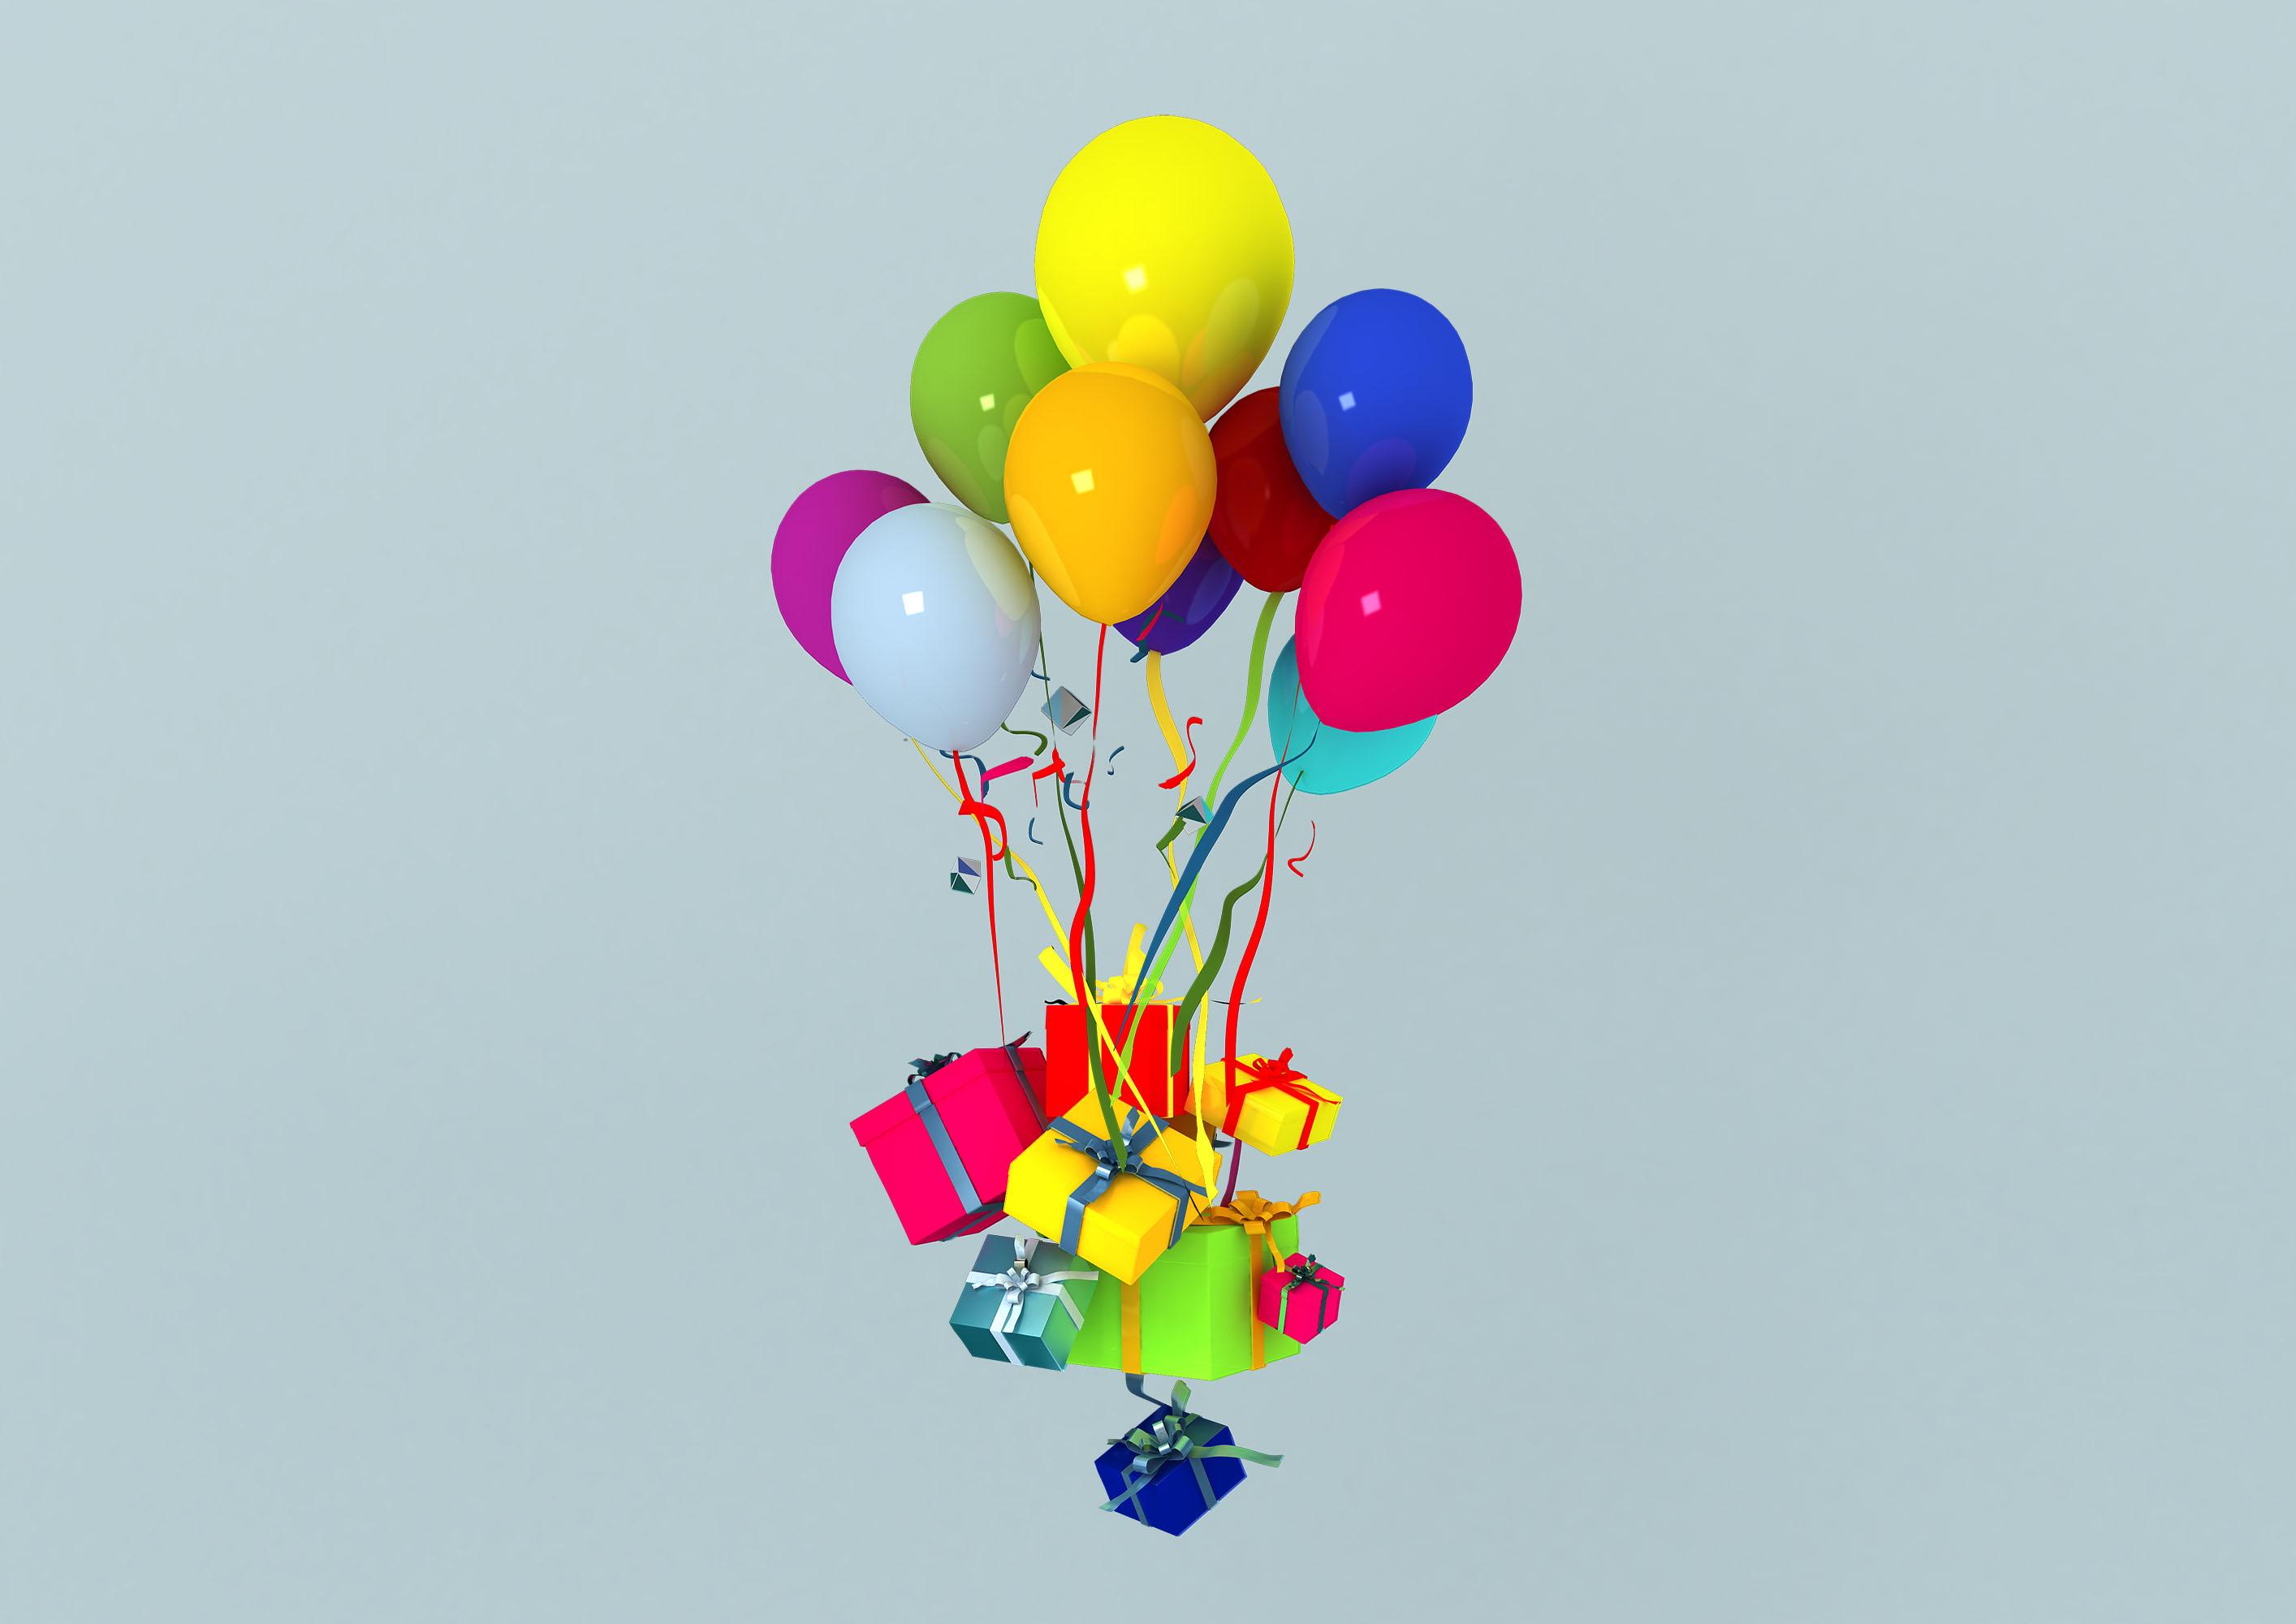 картинки цветы и шарики на белом фоне шафранова физик, психолог